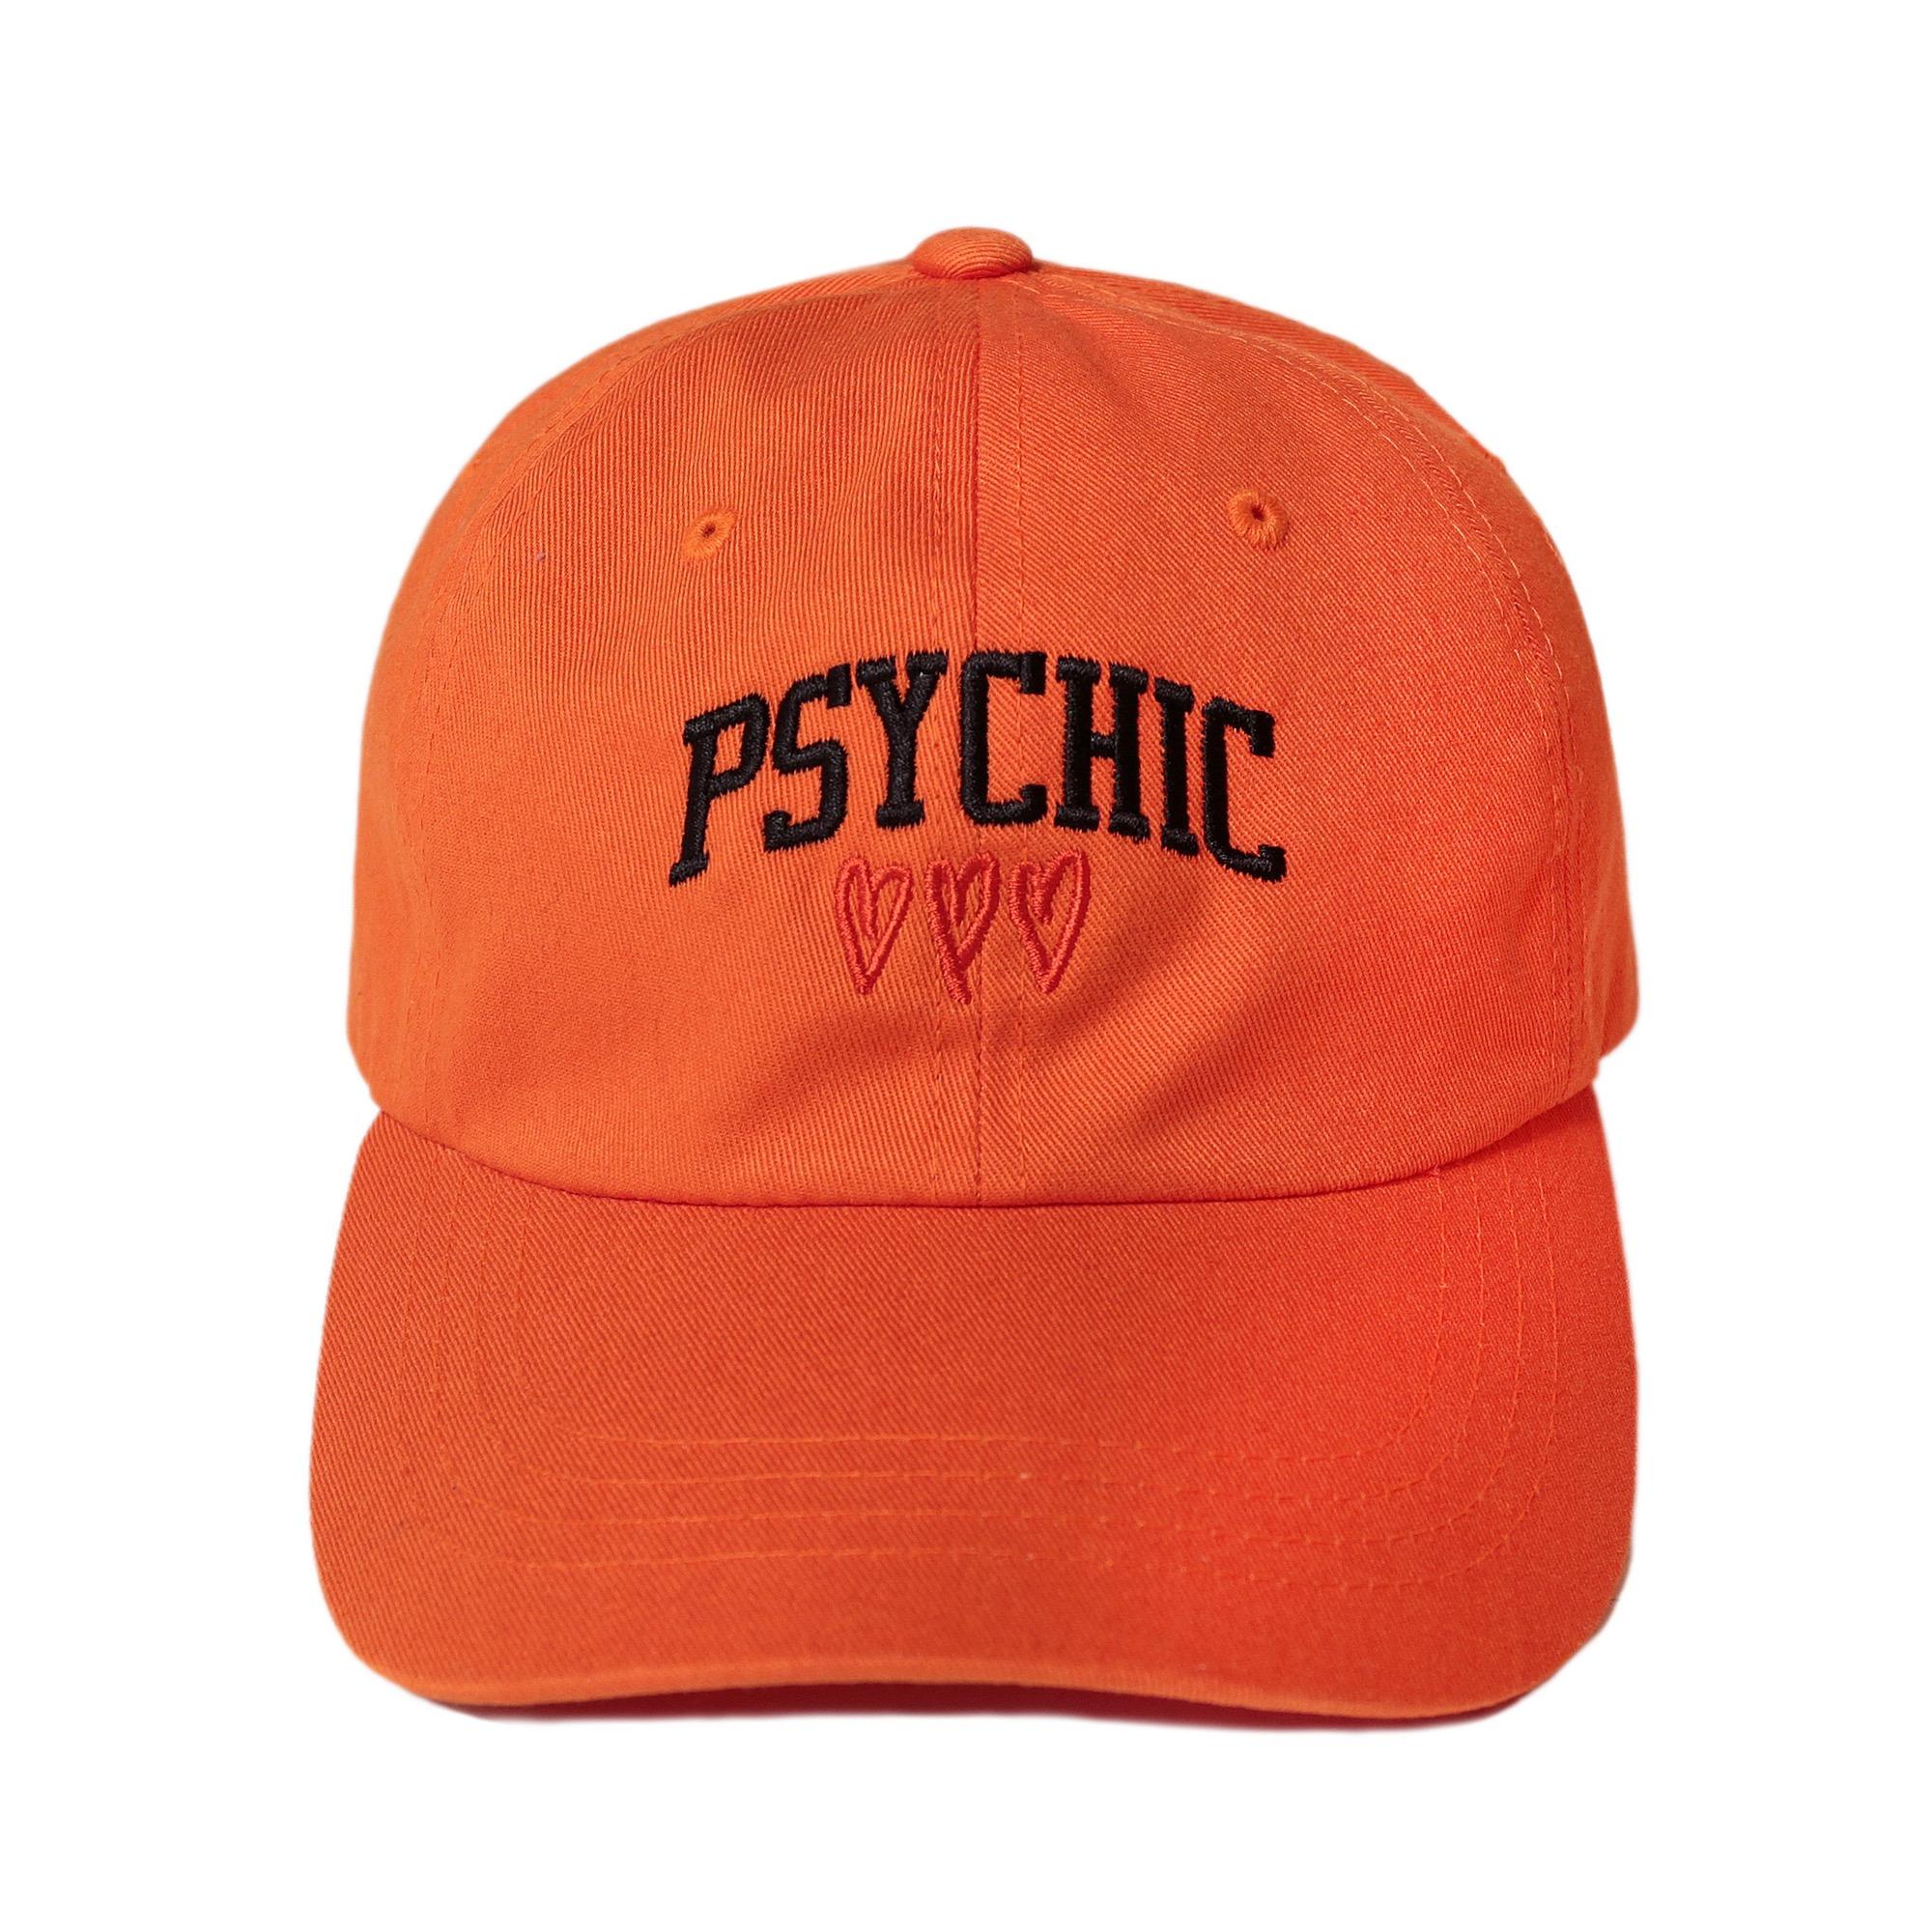 Psychic-Orange-1